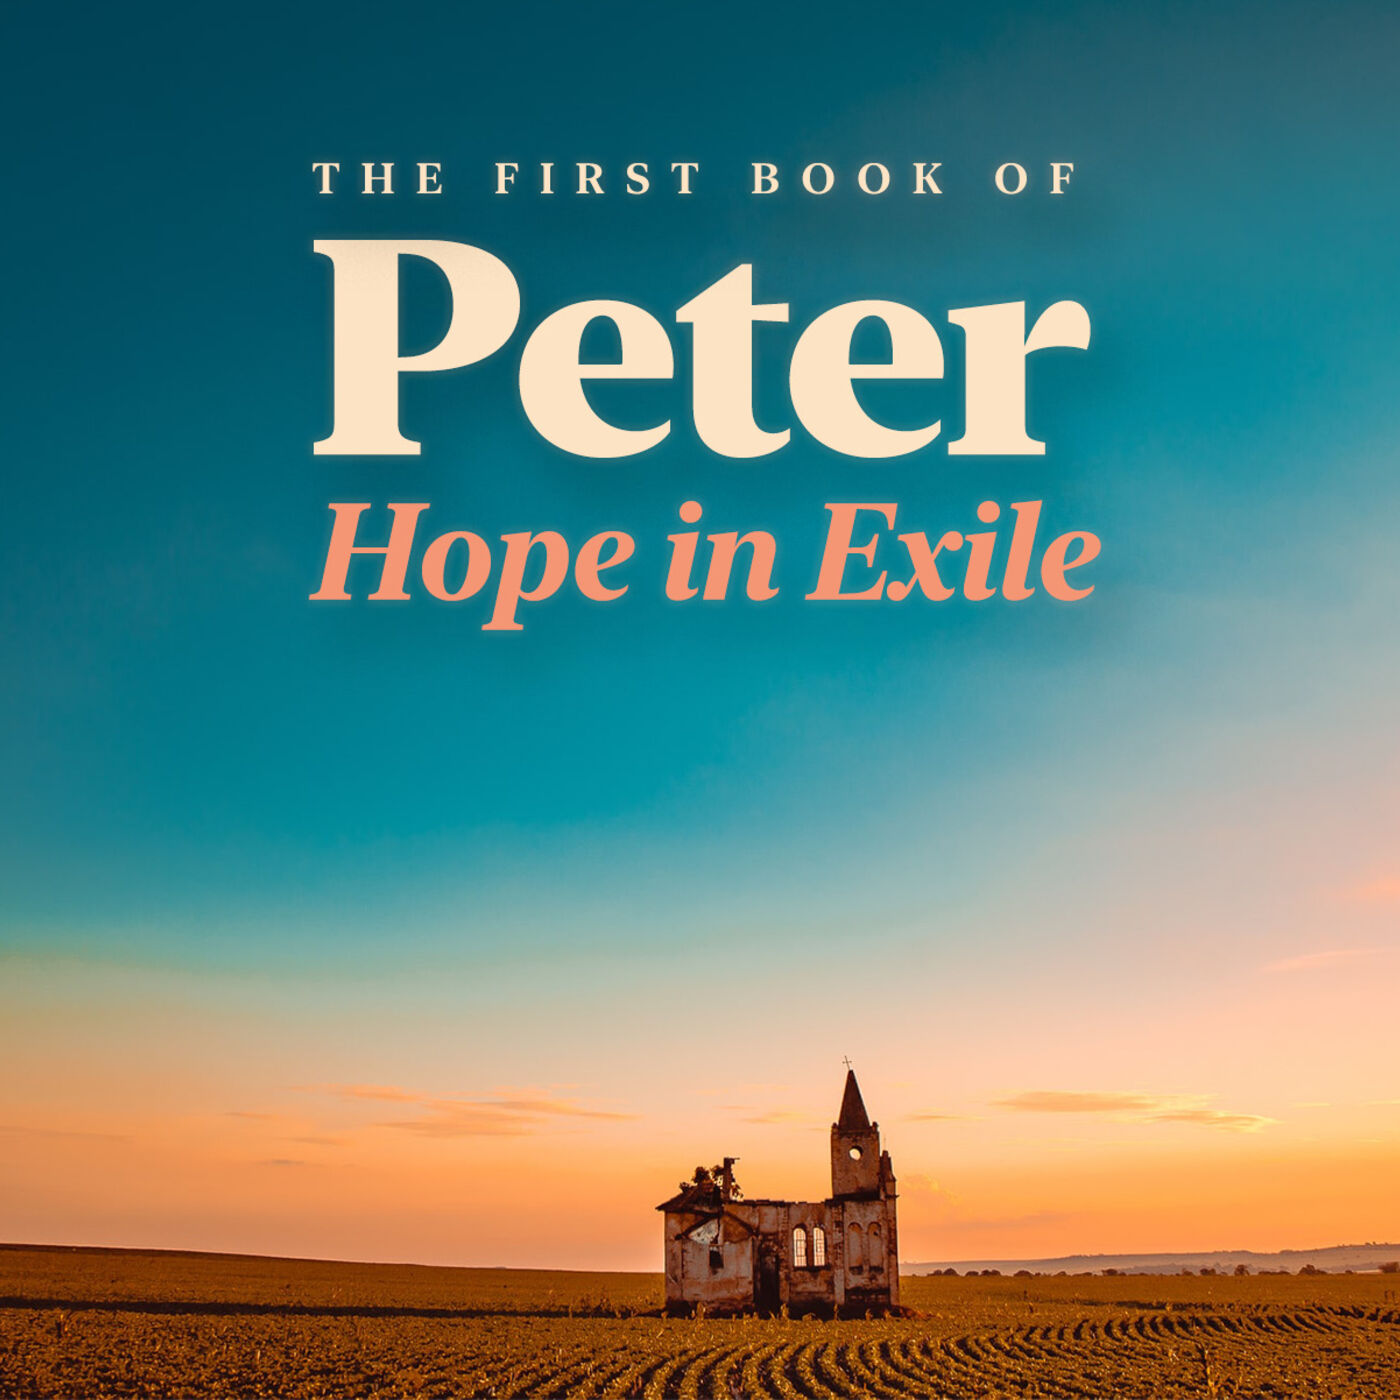 1 Peter 1:1-12 | Pastor Dale Stinson